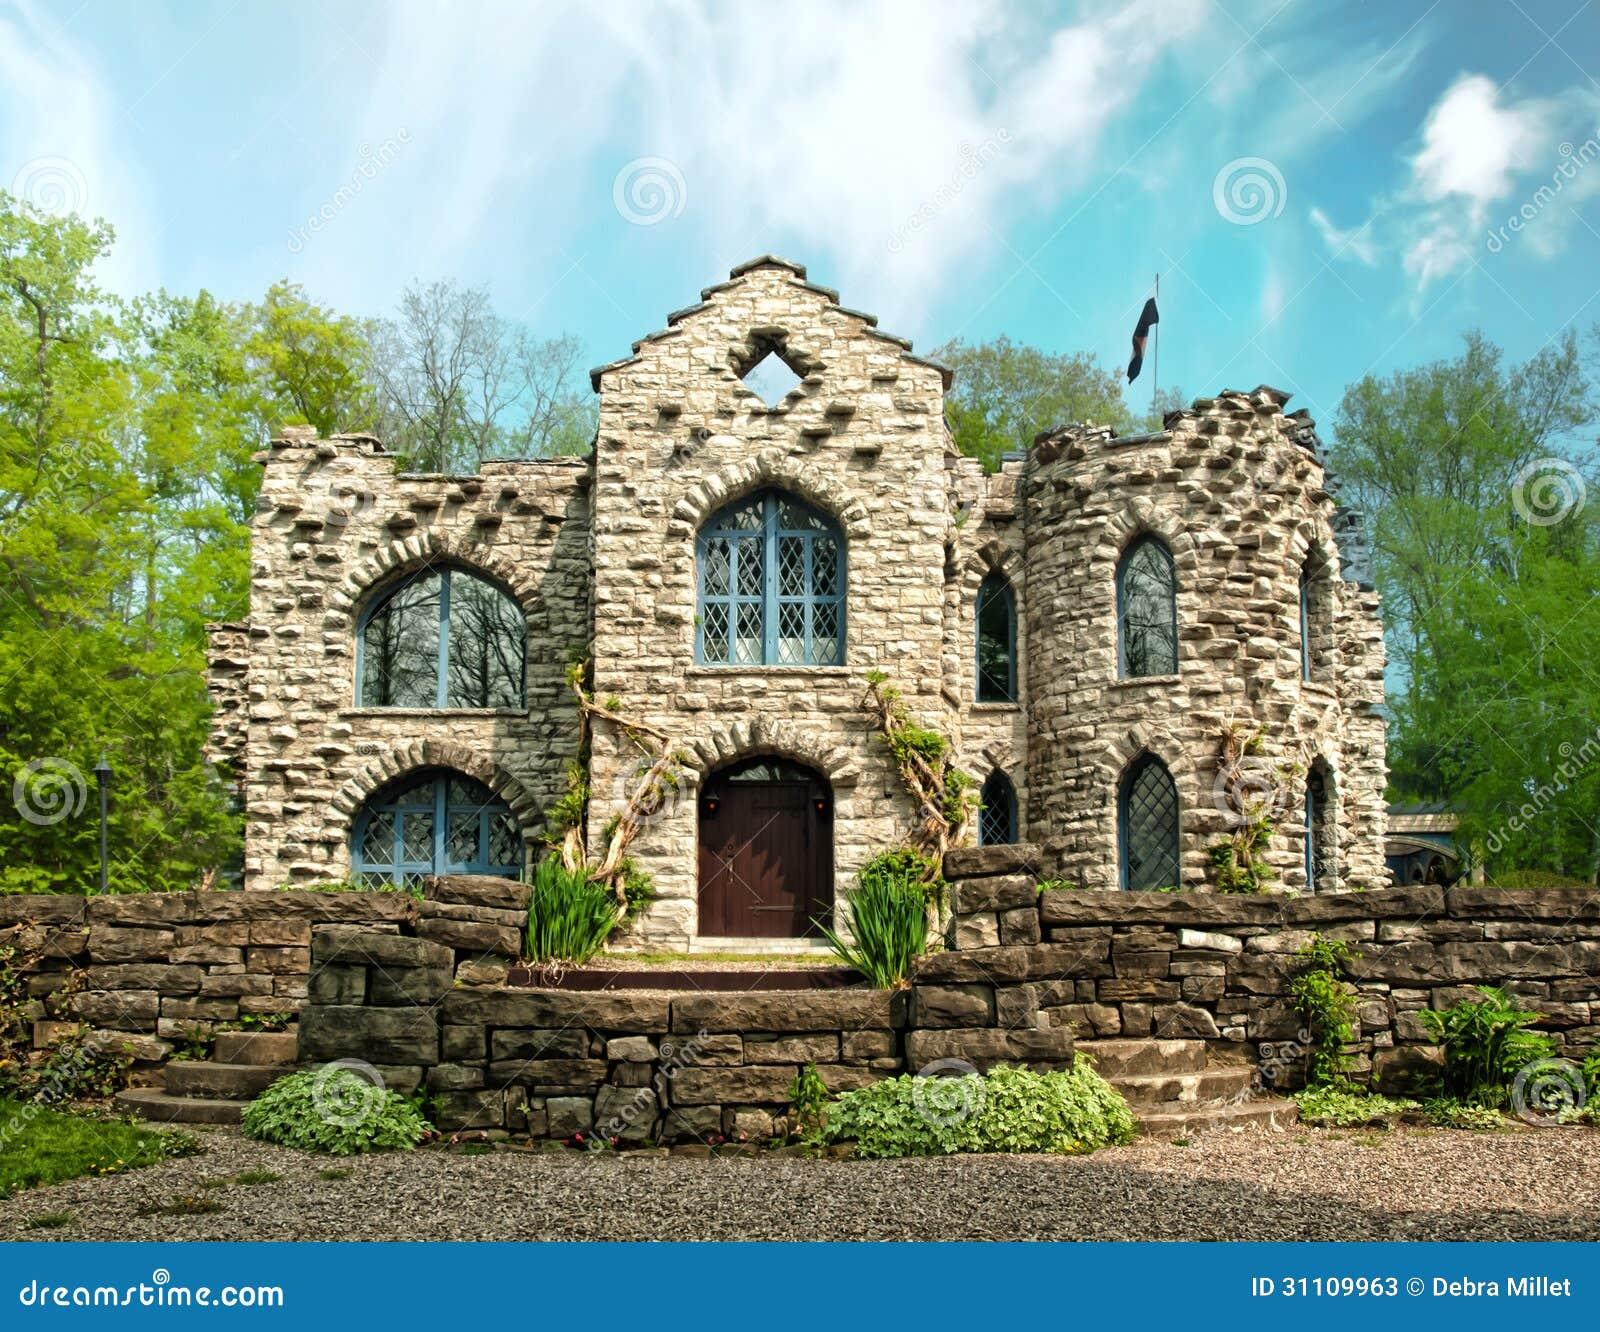 Small Castle Stock Photos - Image: 31109963